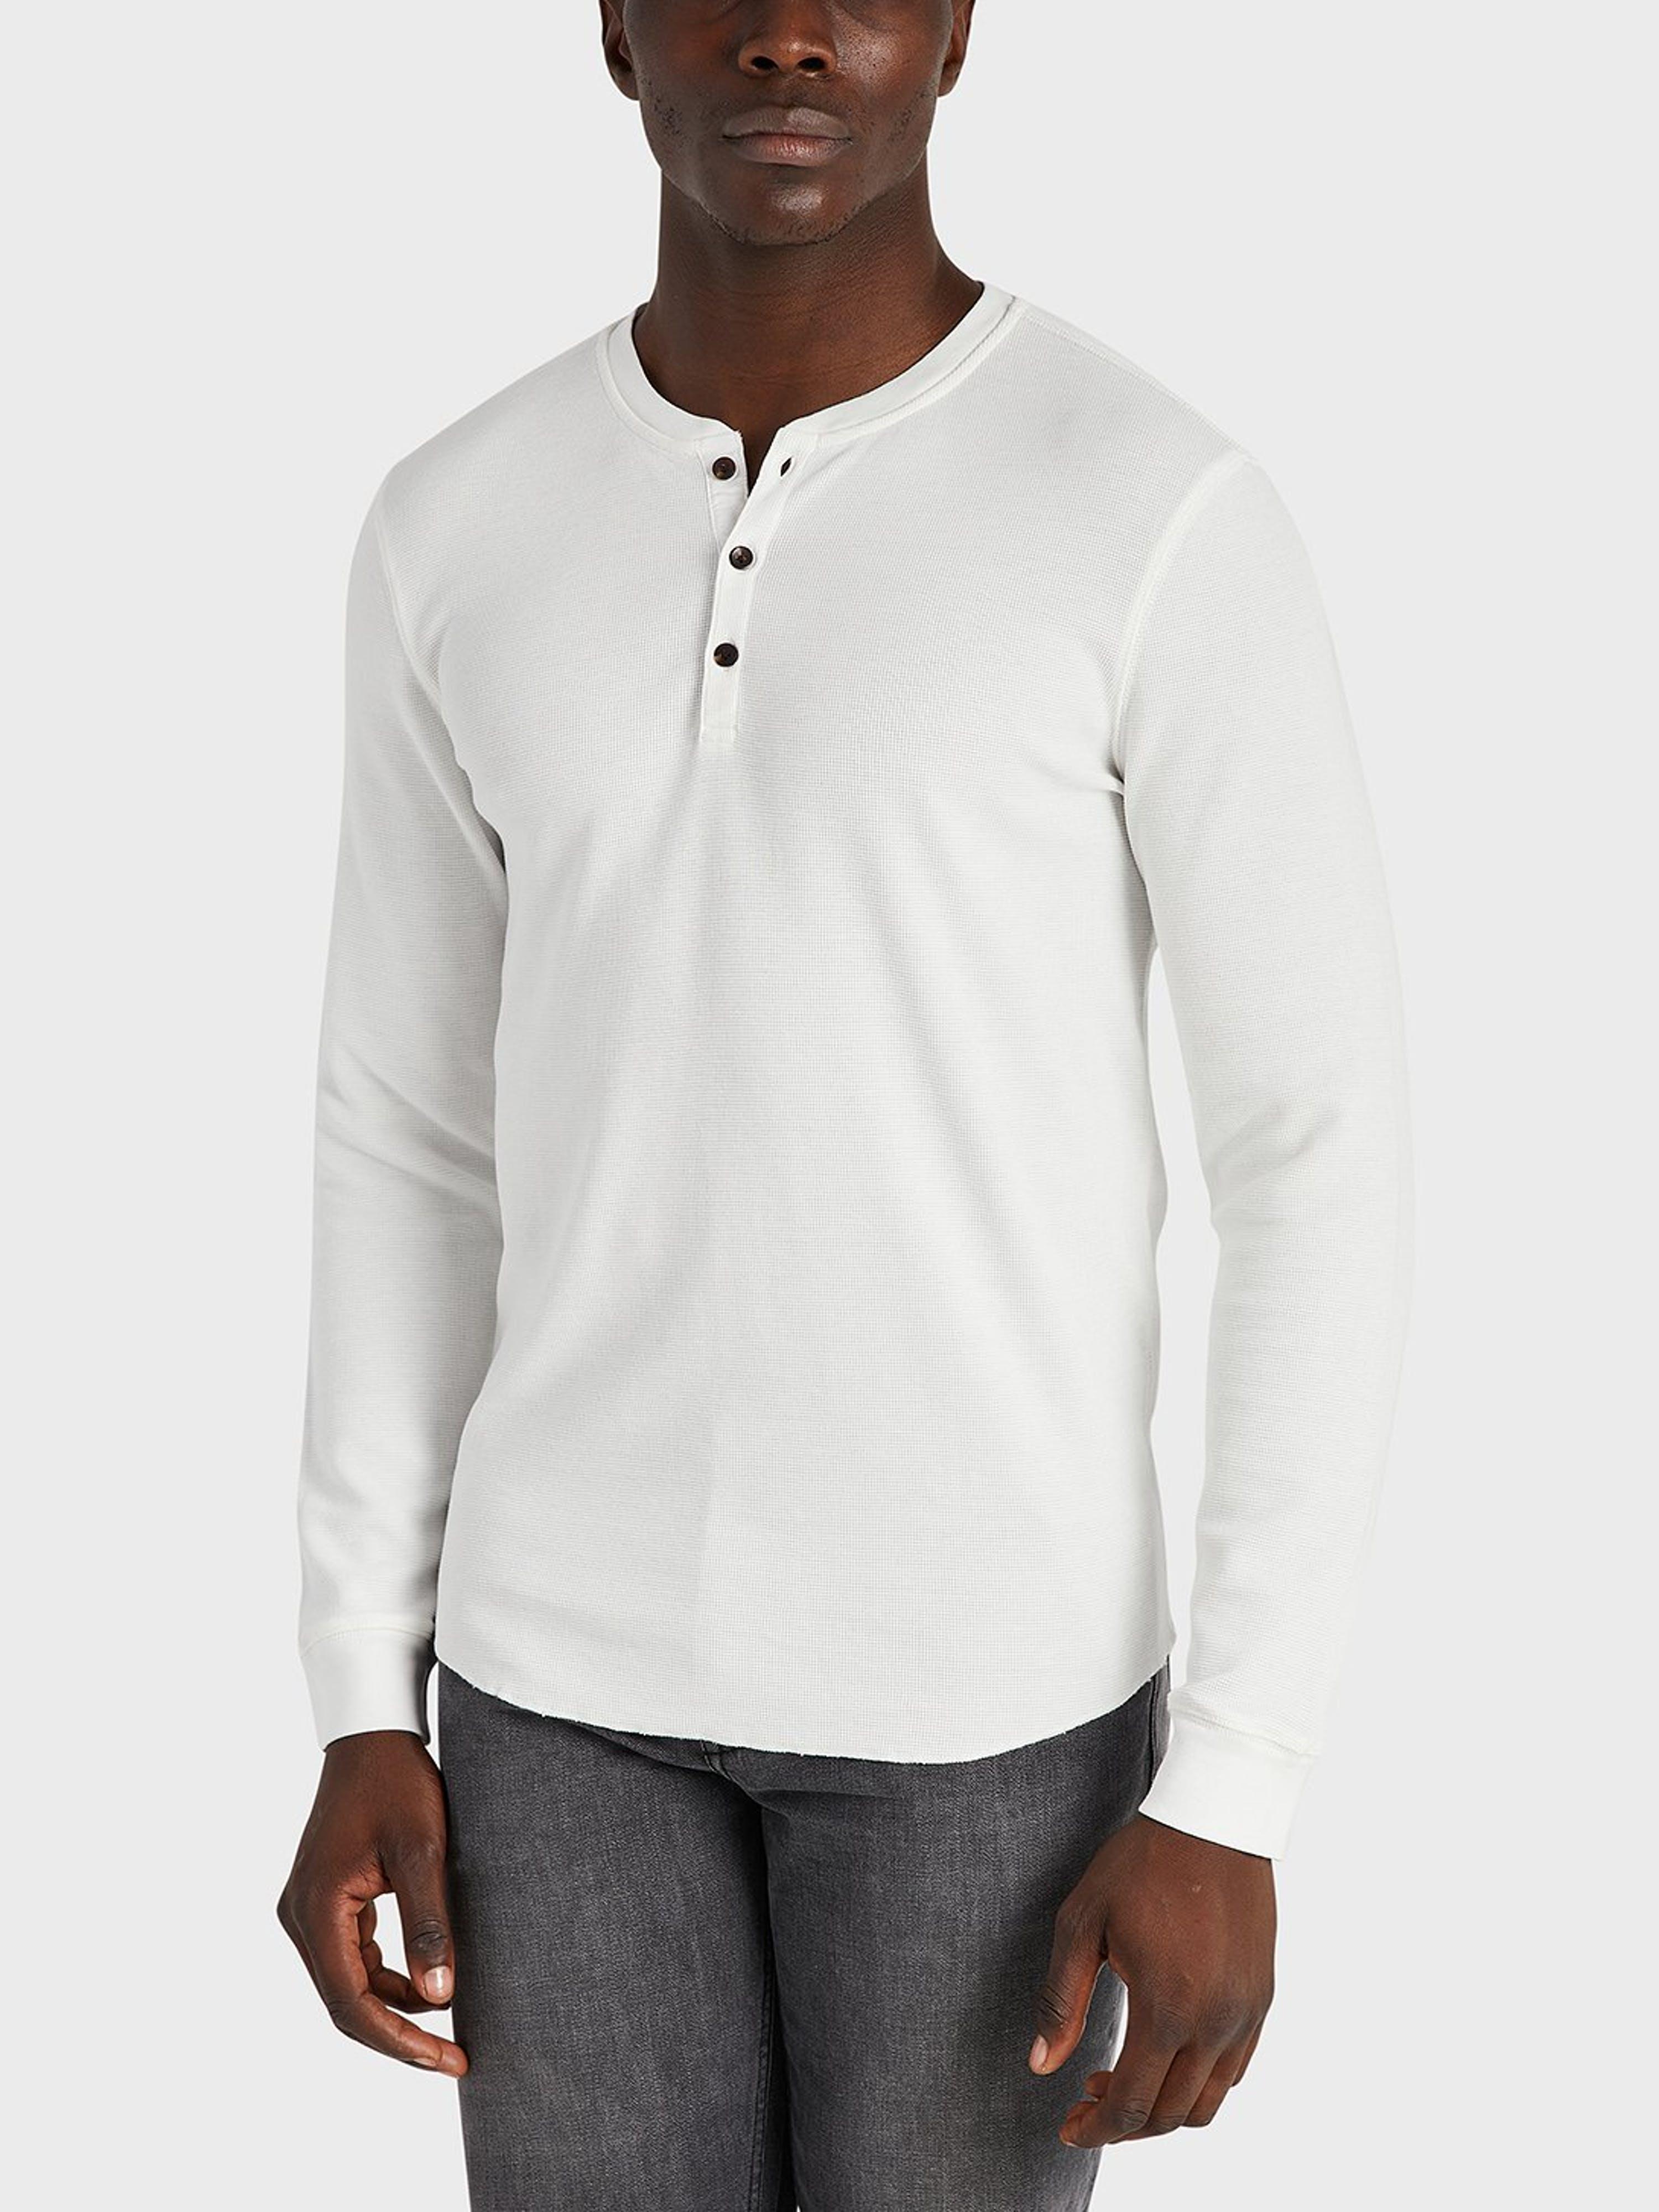 ONS Clothing Court Waffle Henley  - White